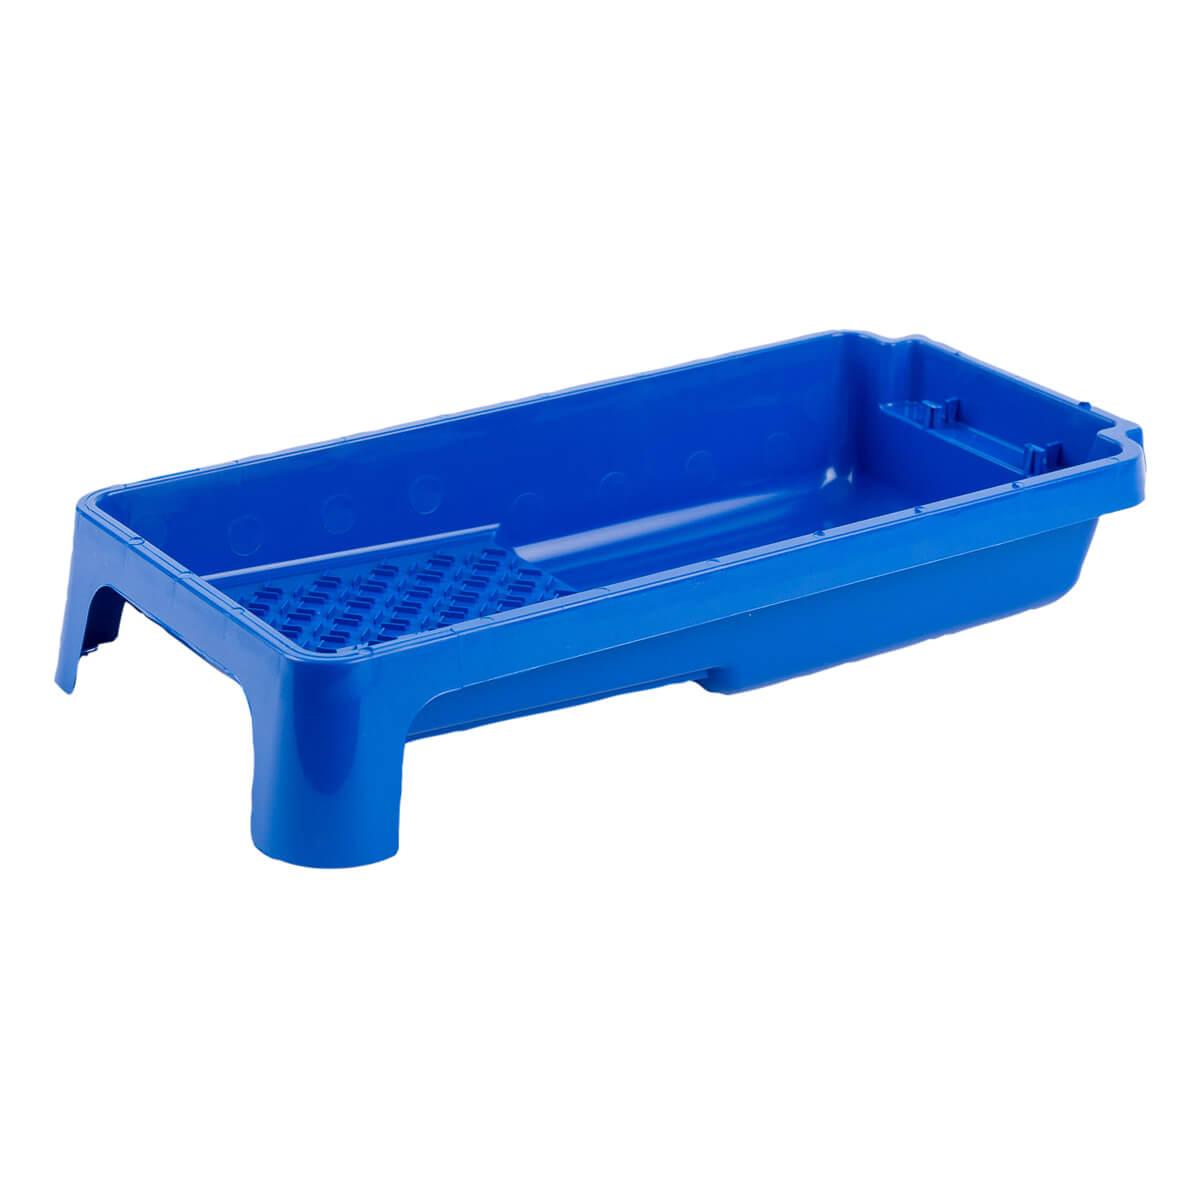 Plastic Mini Tray - 6-in